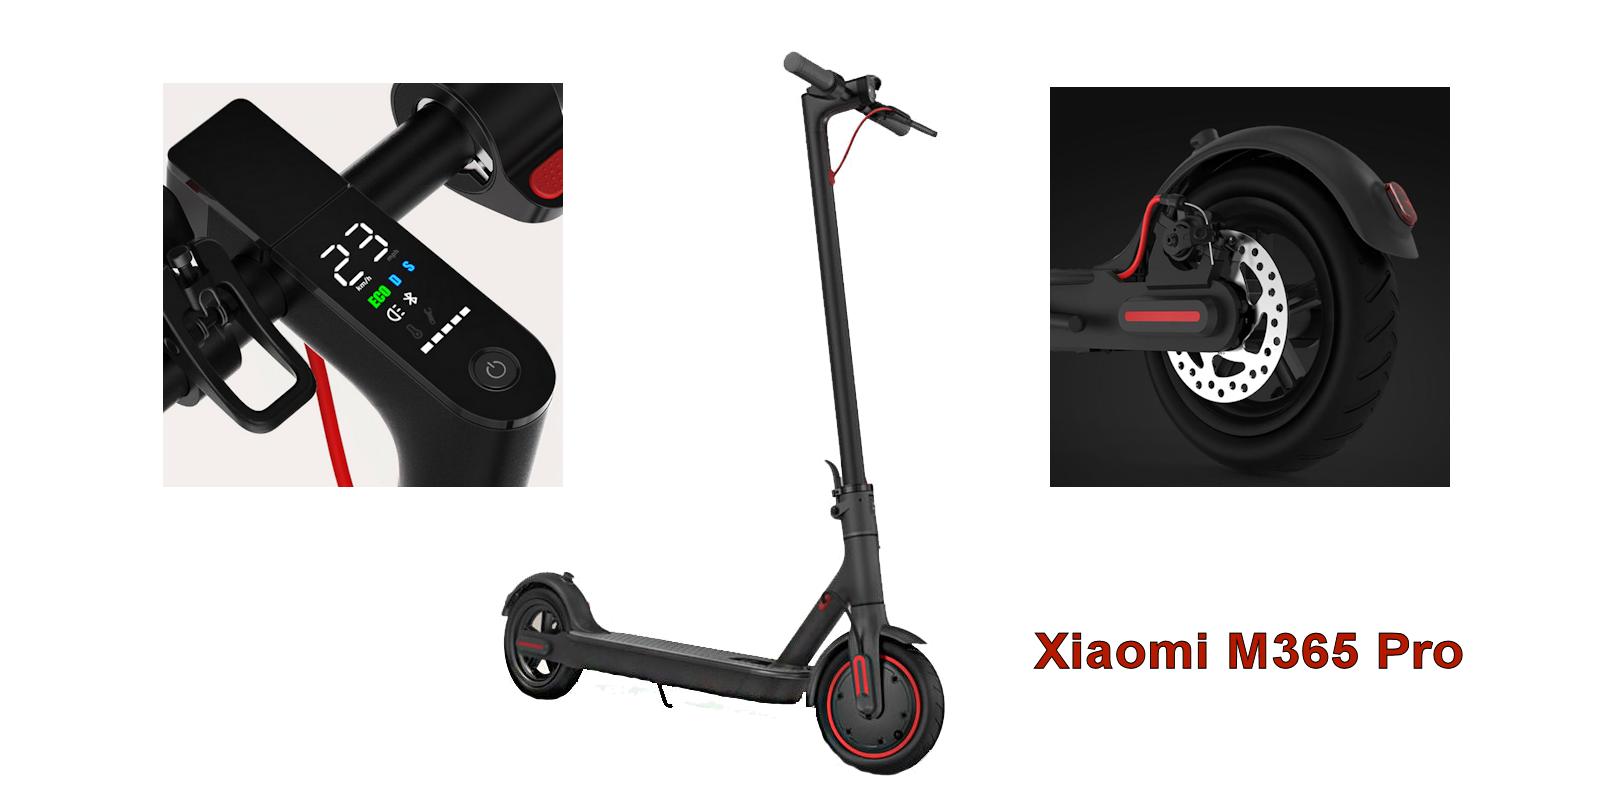 xiaomi-m365-pro-elektromos-roller-2019-osszehasonlitas-teszt-00.png